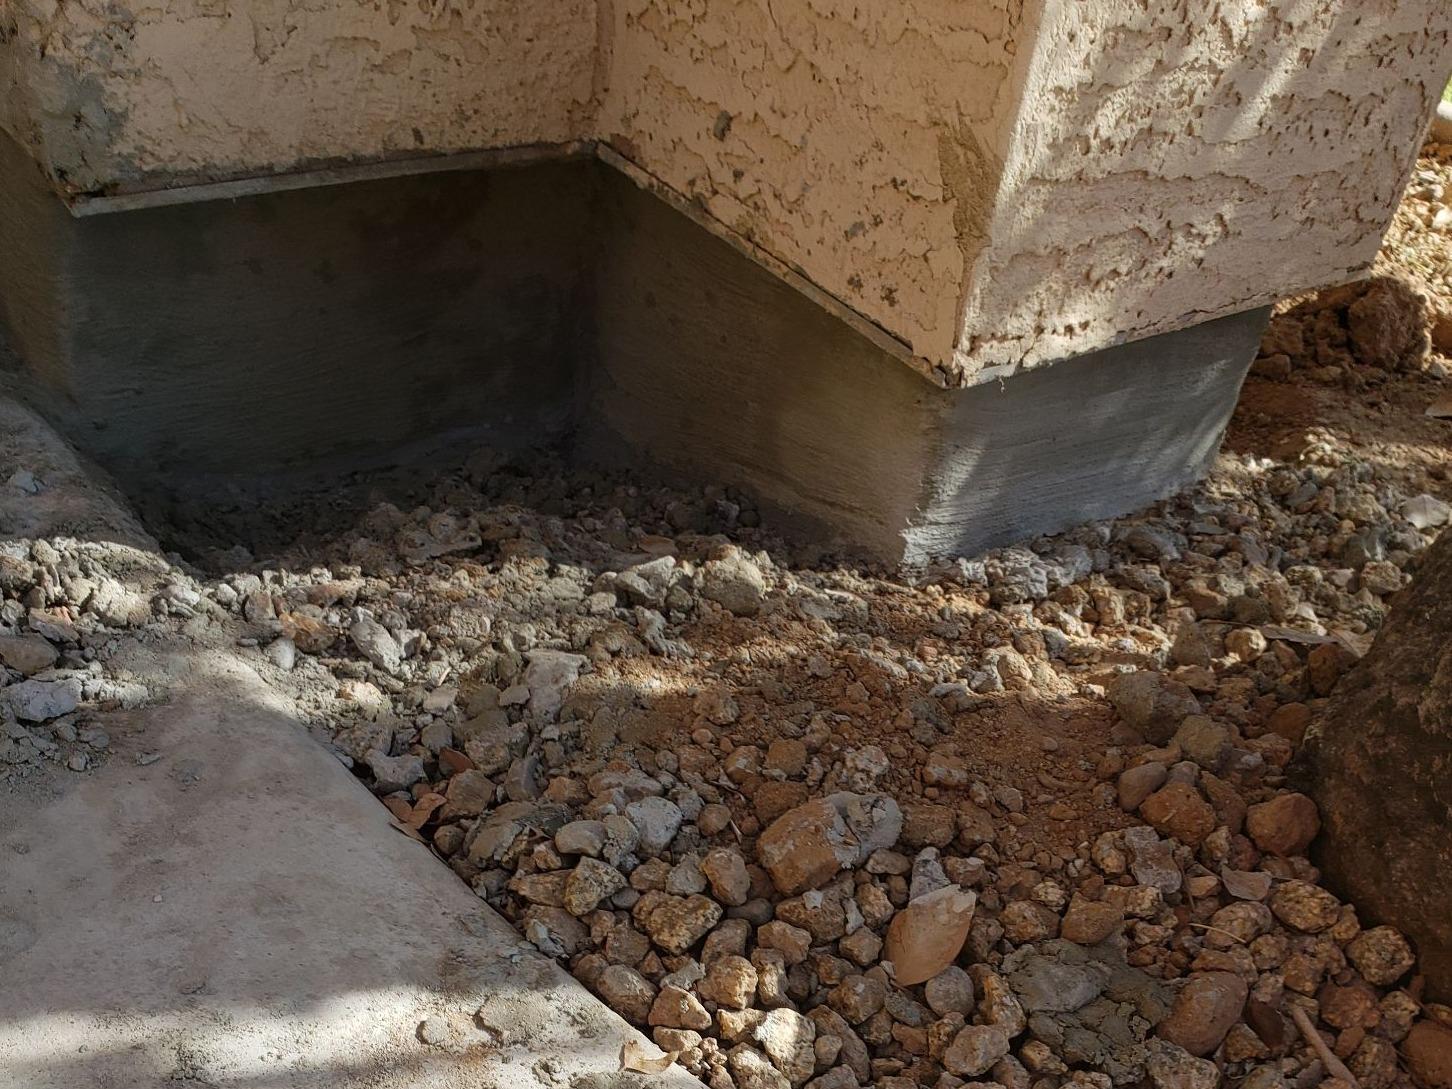 Concrete Stem Wall Repair - Chandler, AZ - After Photo